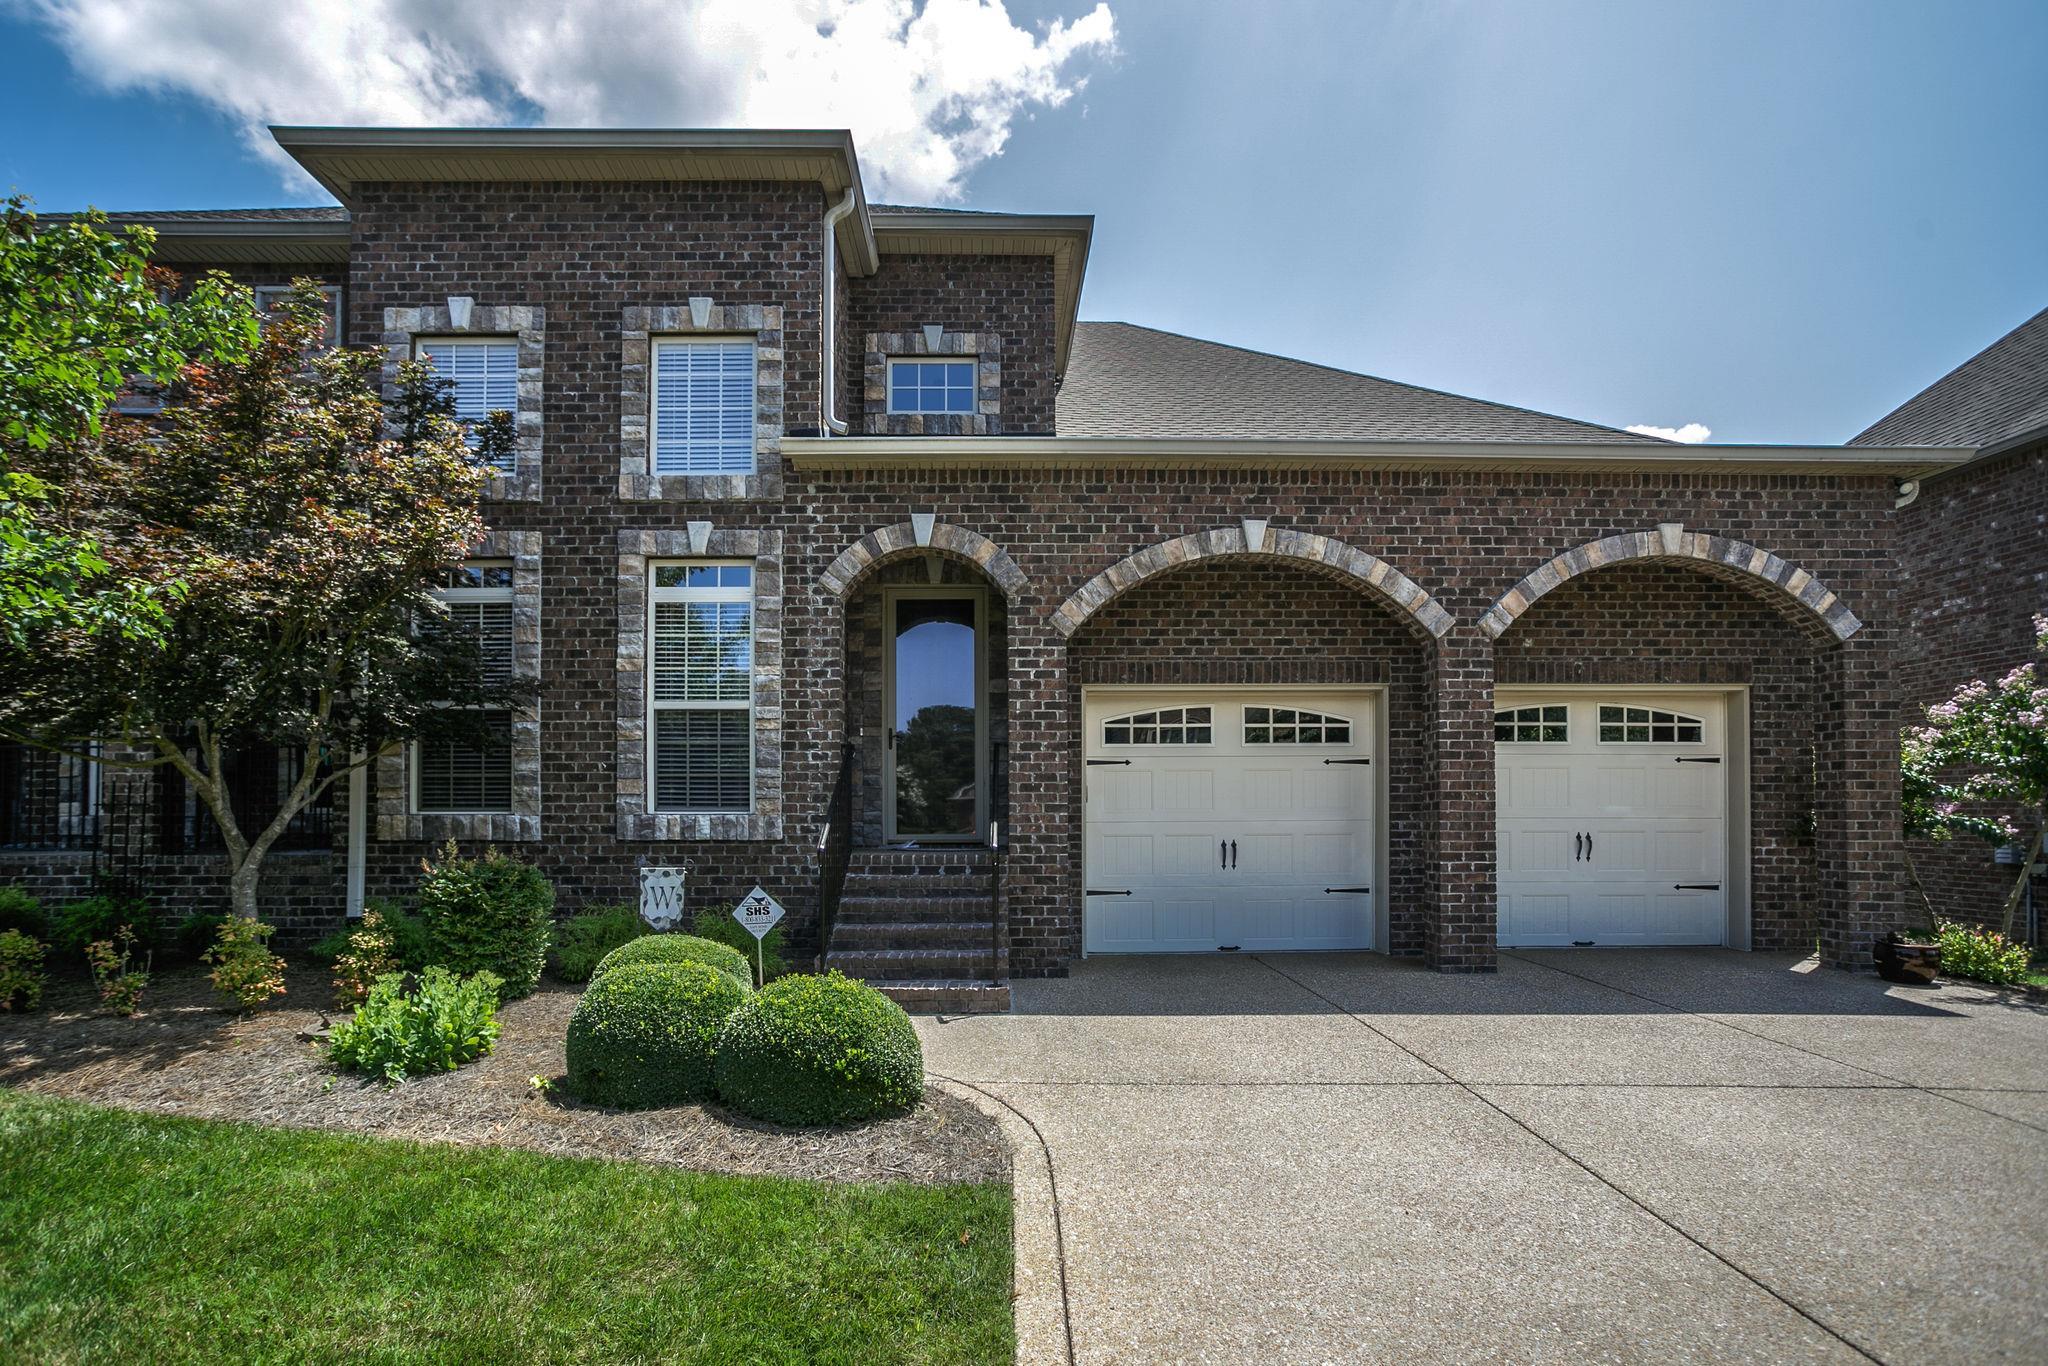 175 Tara Ln, Goodlettsville, TN 37072 - Goodlettsville, TN real estate listing